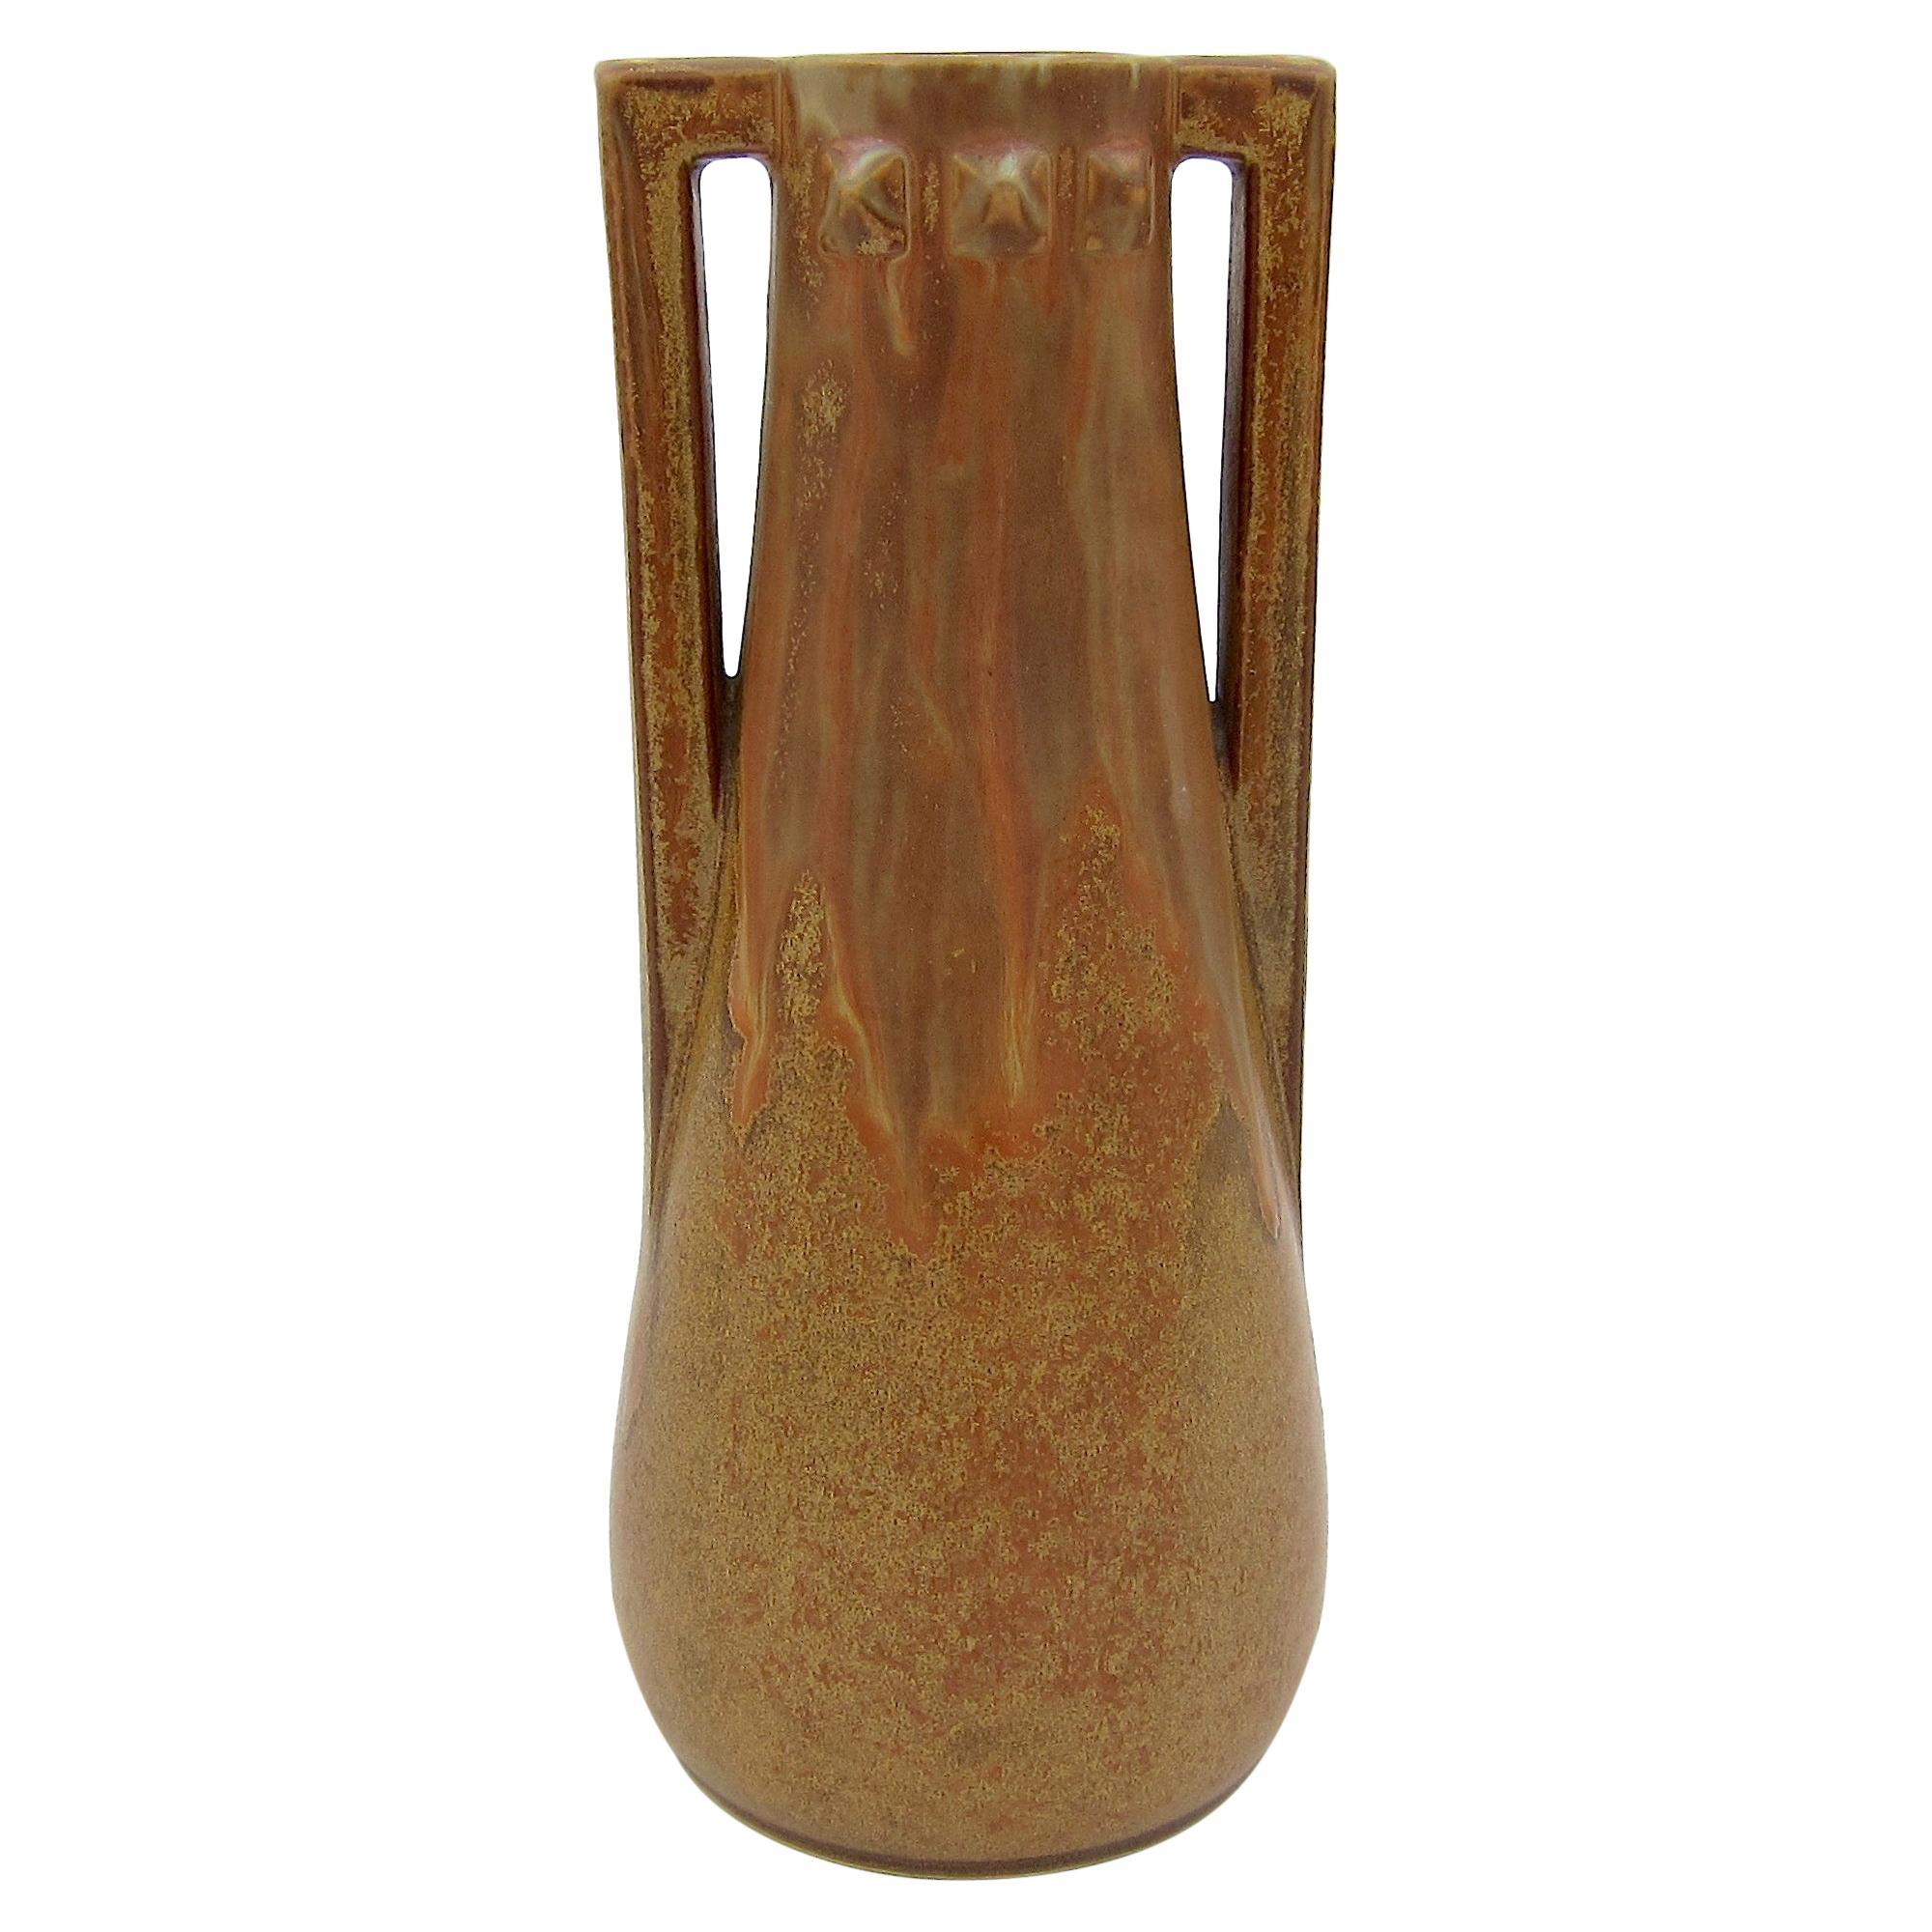 Denbac French Art Nouveau Vase with Crystalline Glaze